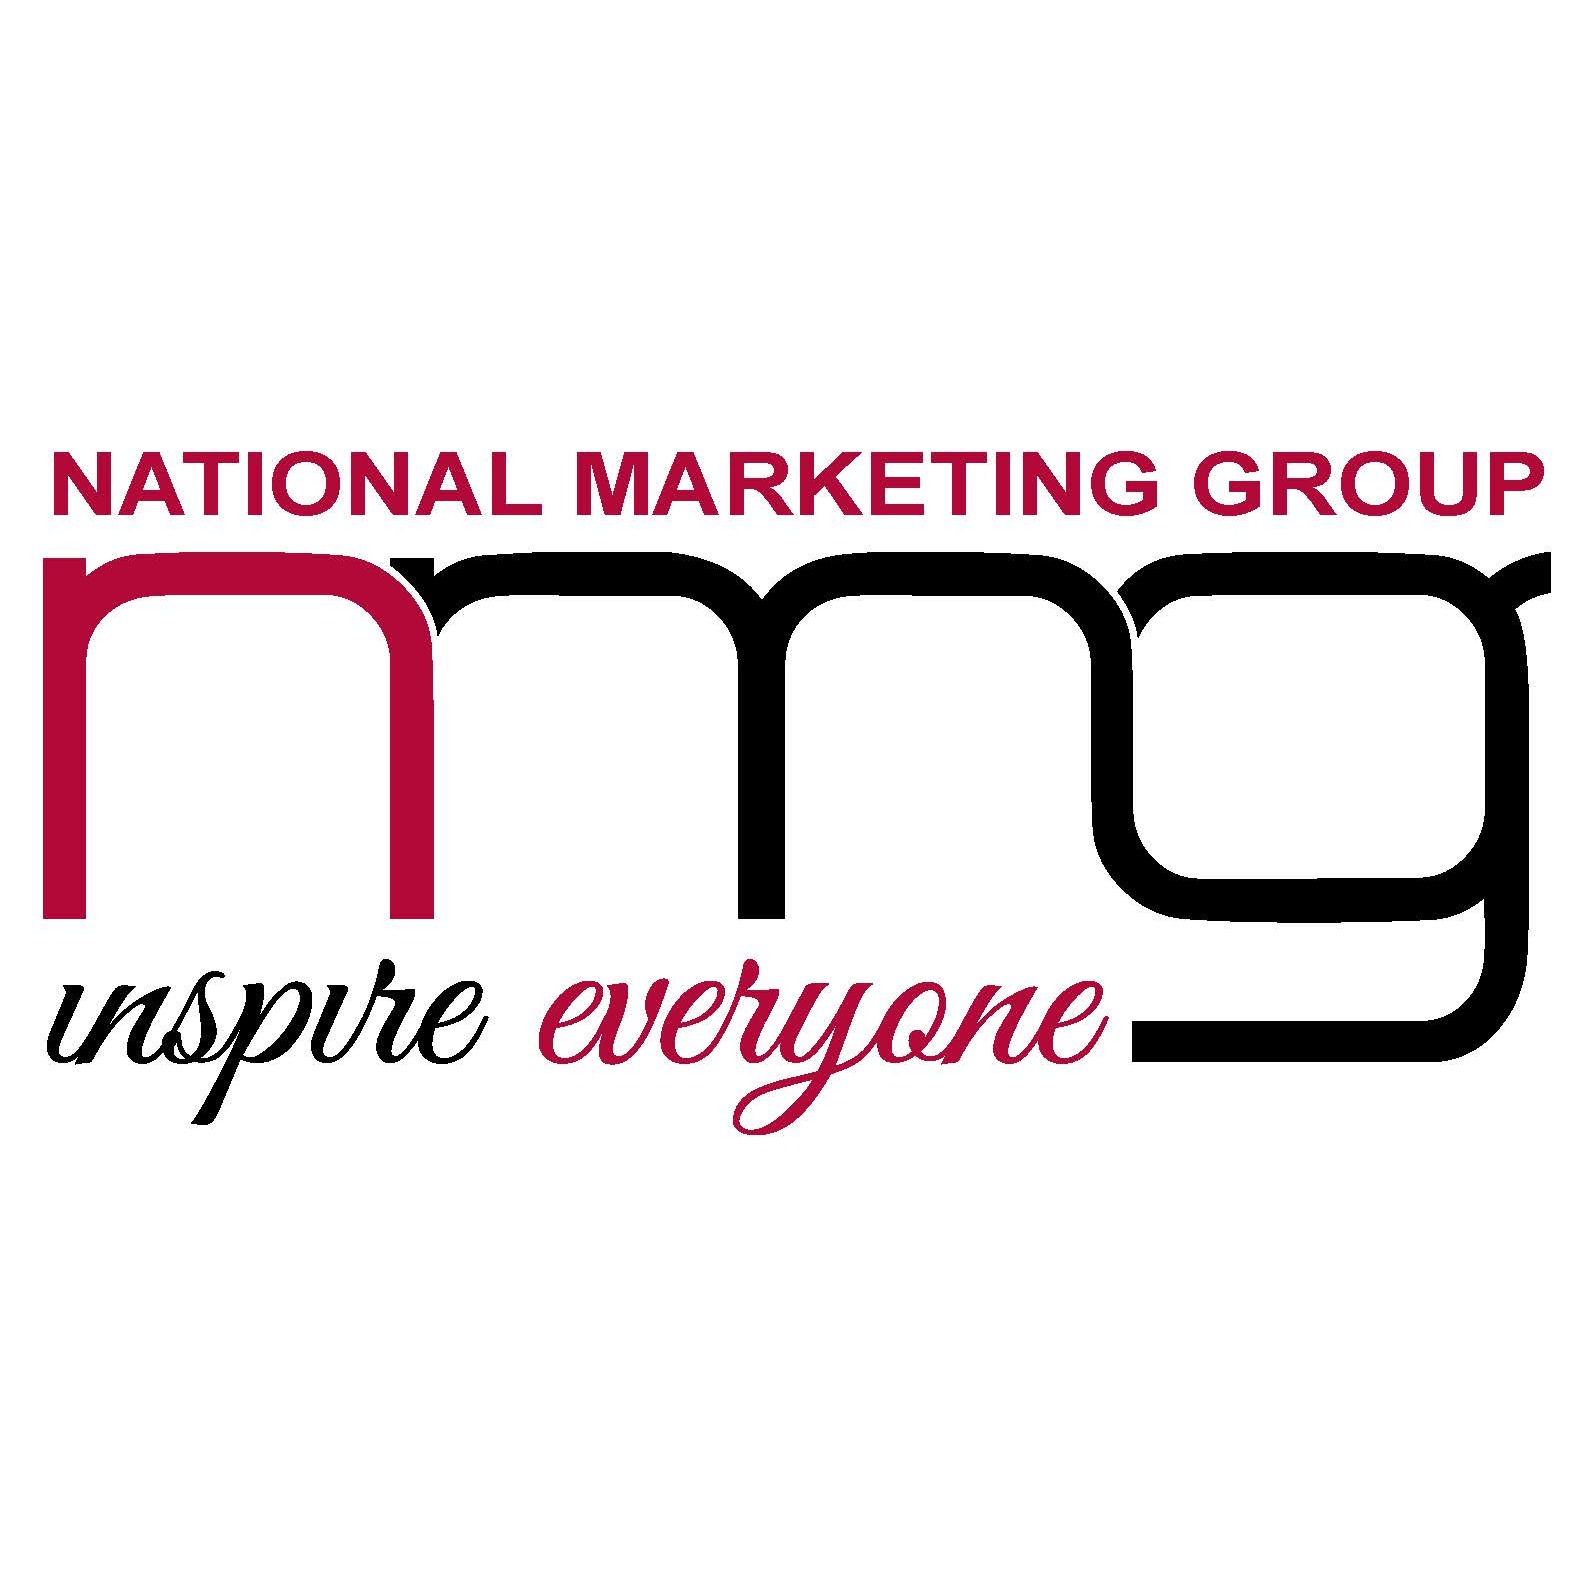 National Marketing Group - NMG